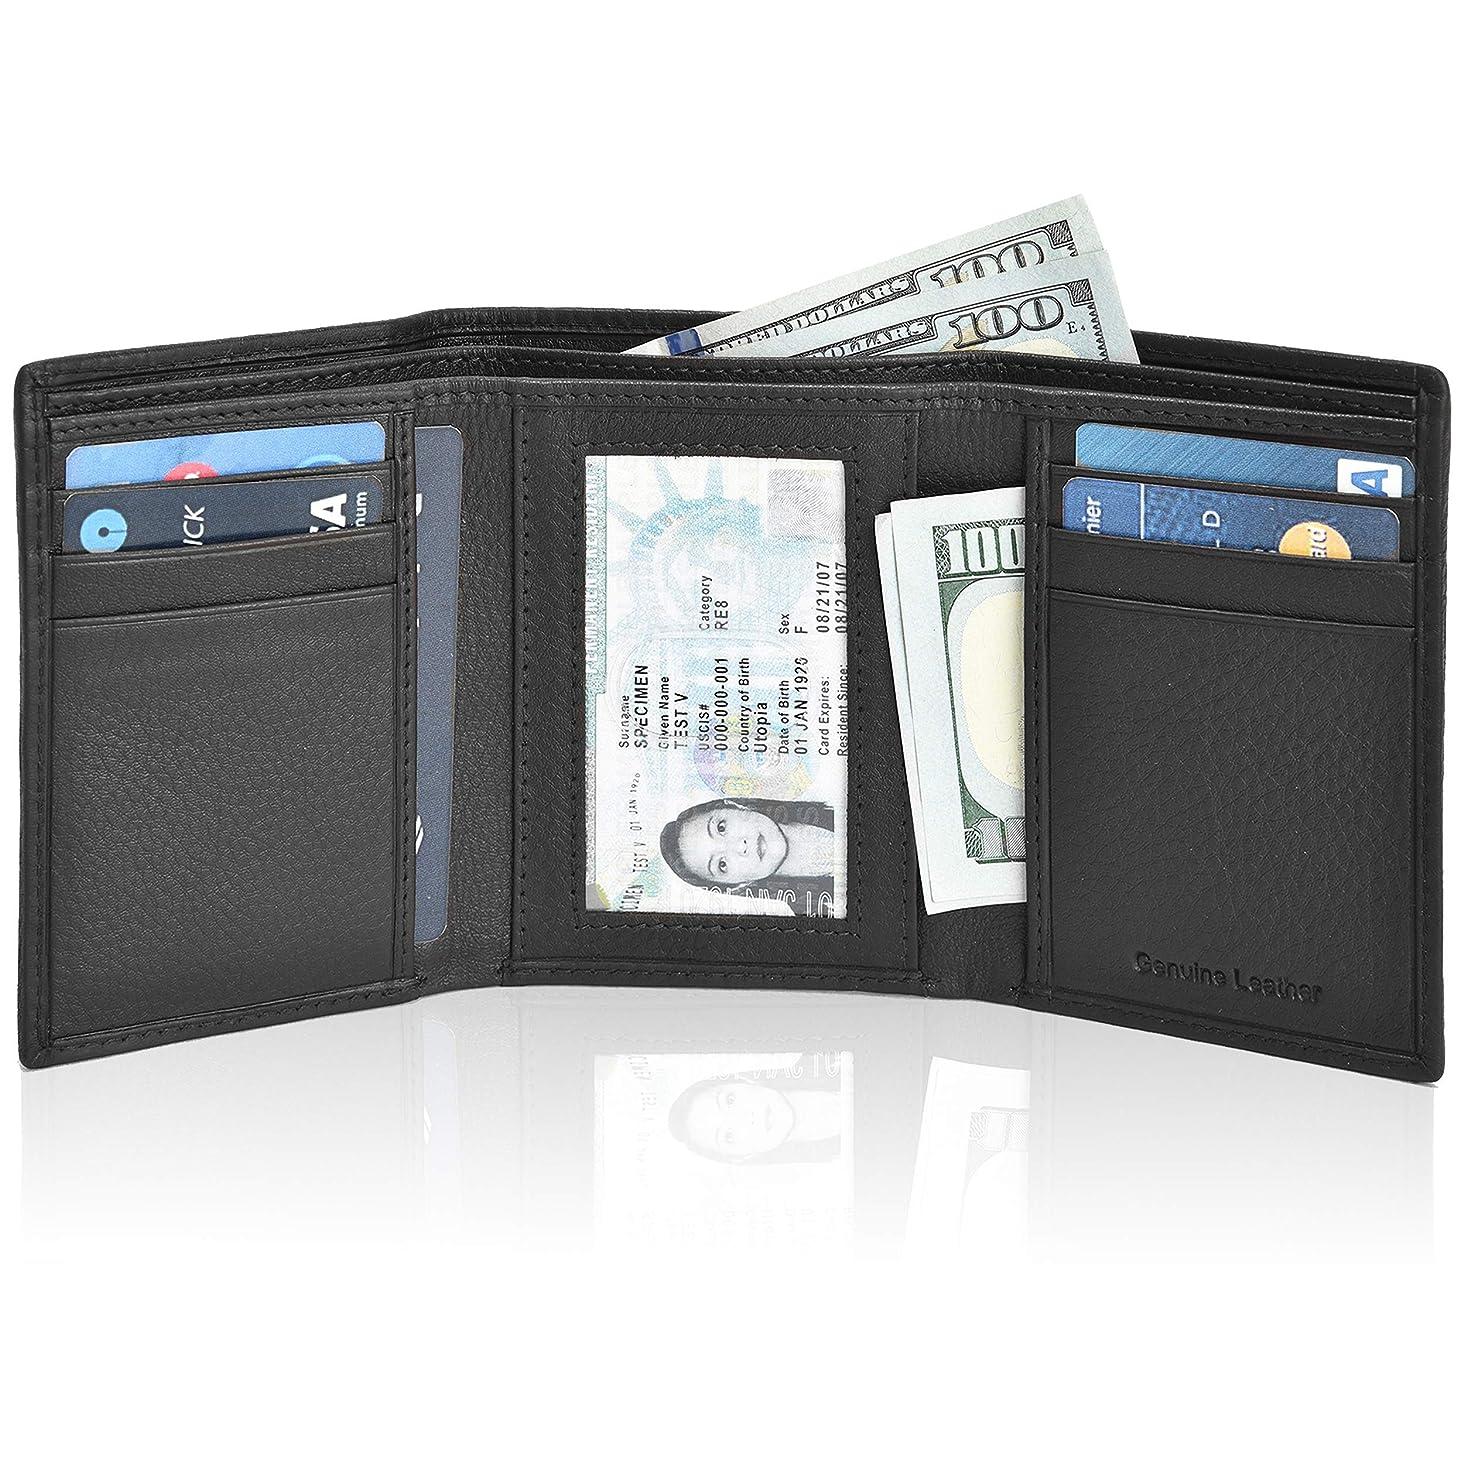 Slim Leather wallets for Men – Slim wallet trifold wallet RFID Leather wallet for men leather wallet mens slim wallet small